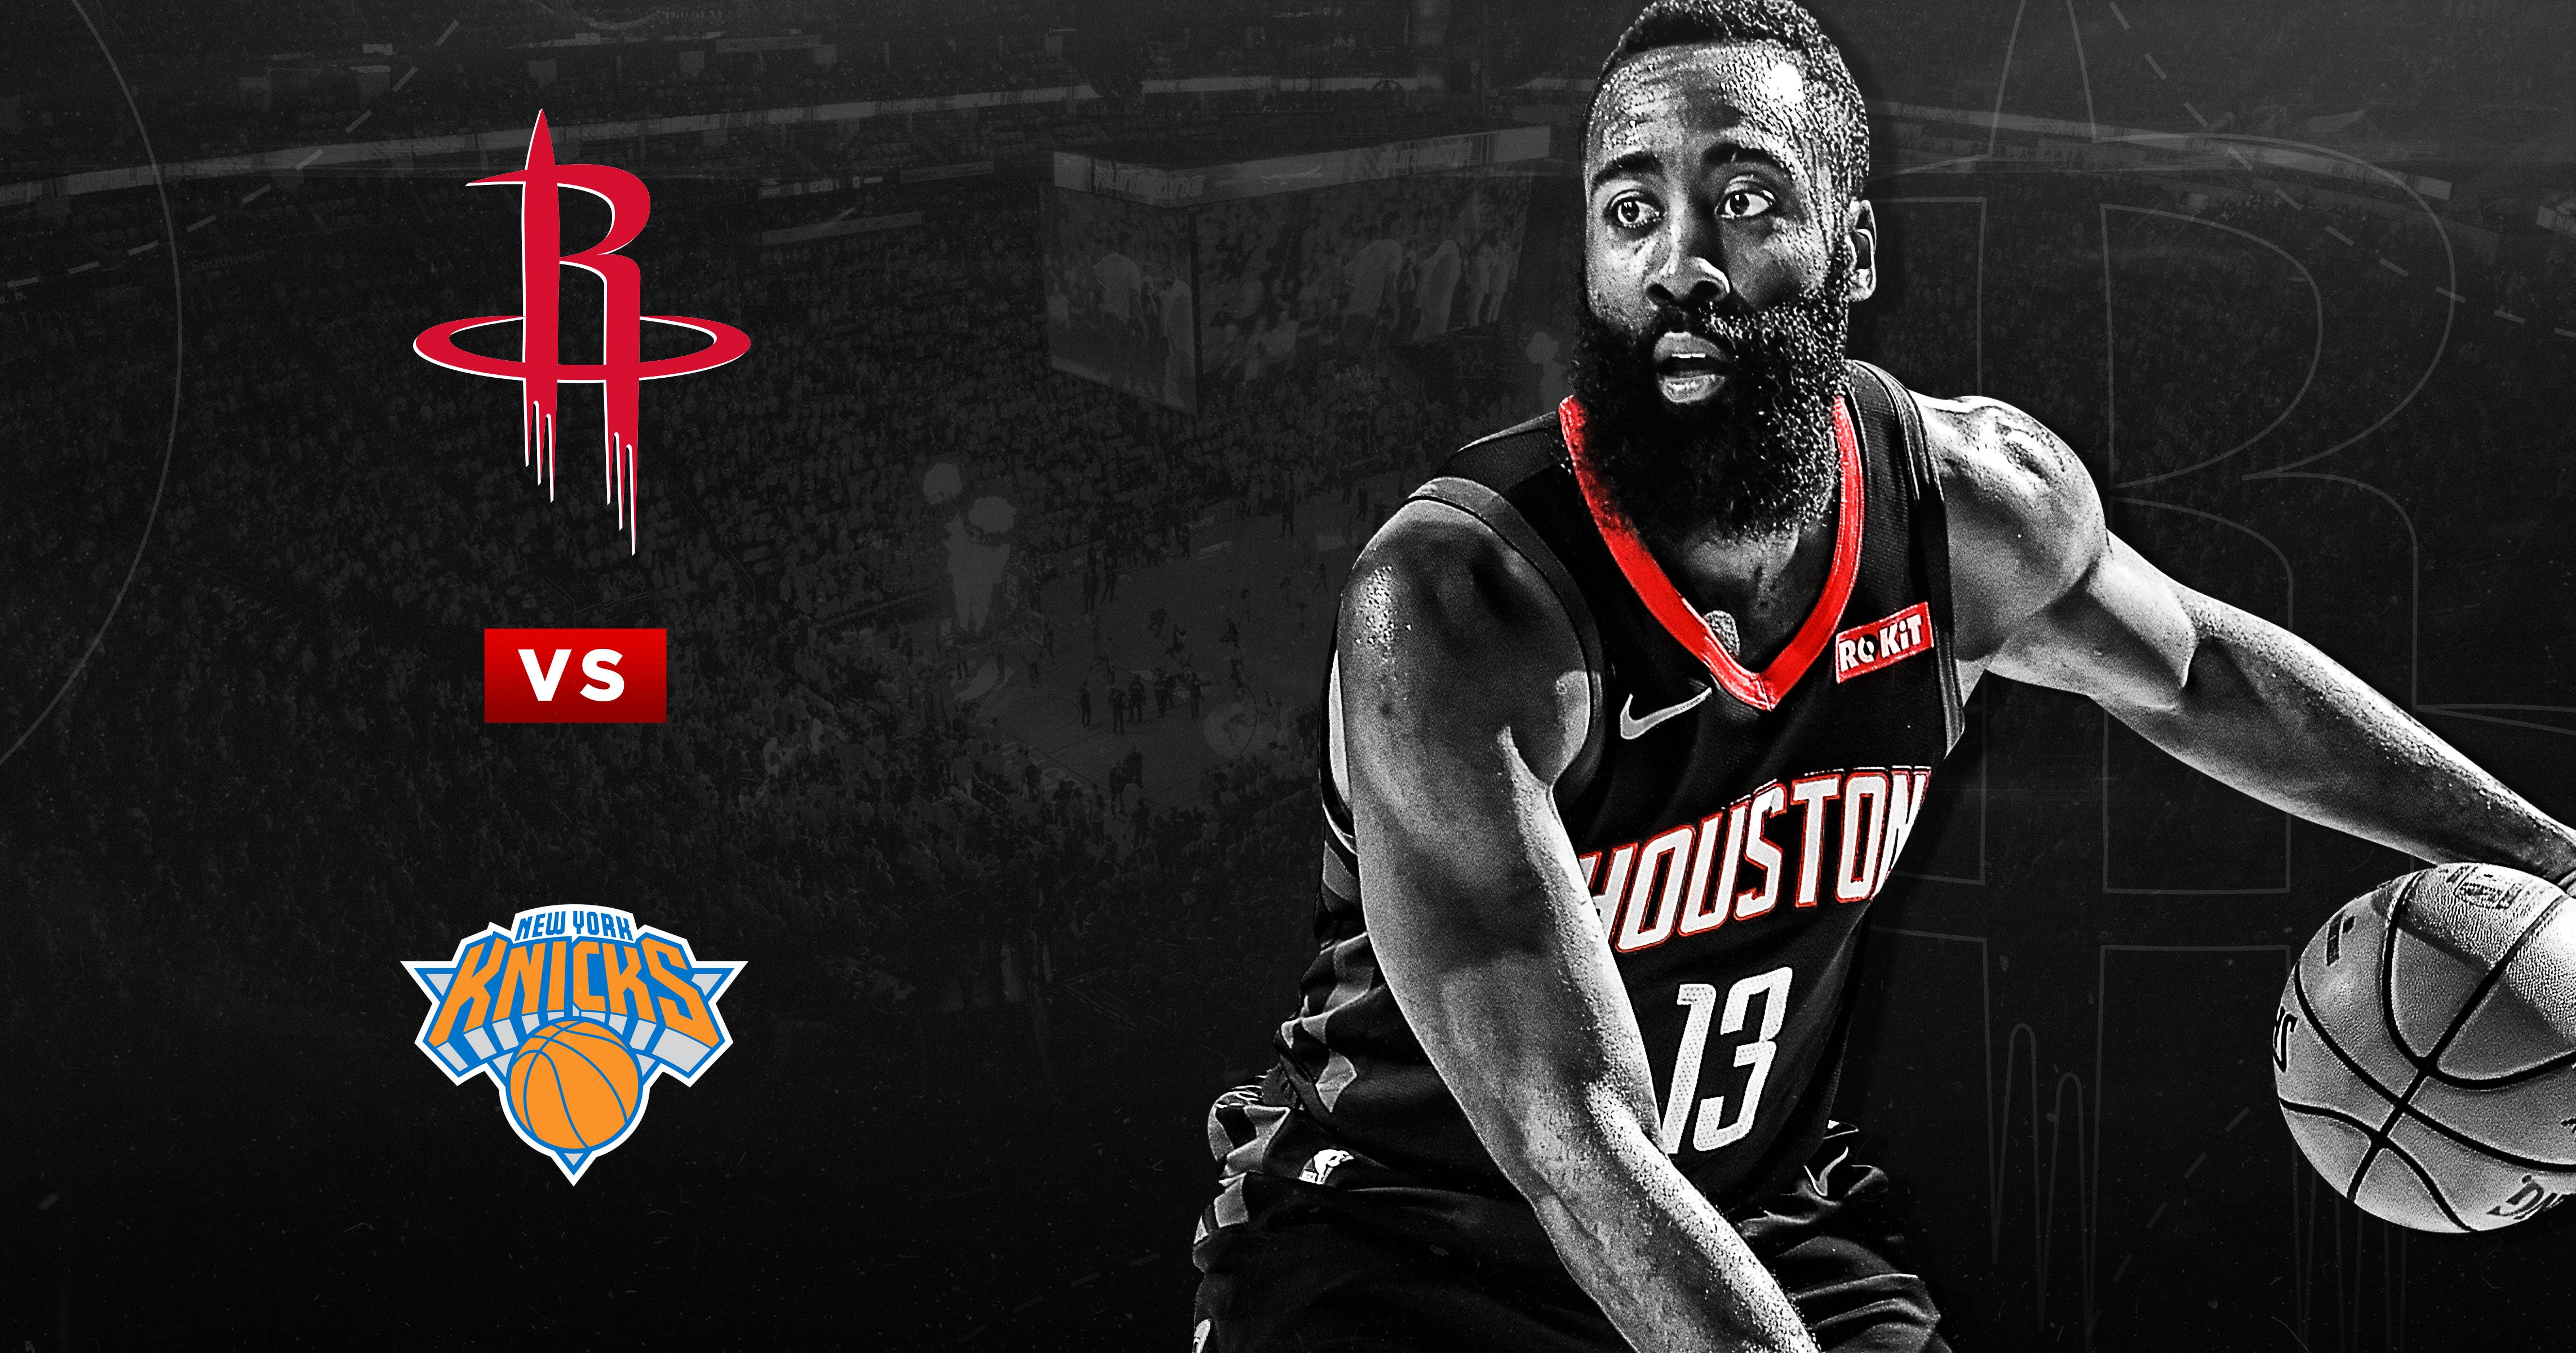 timeless design 27111 7f986 Houston Rockets vs. New York Knicks | Houston Toyota Center